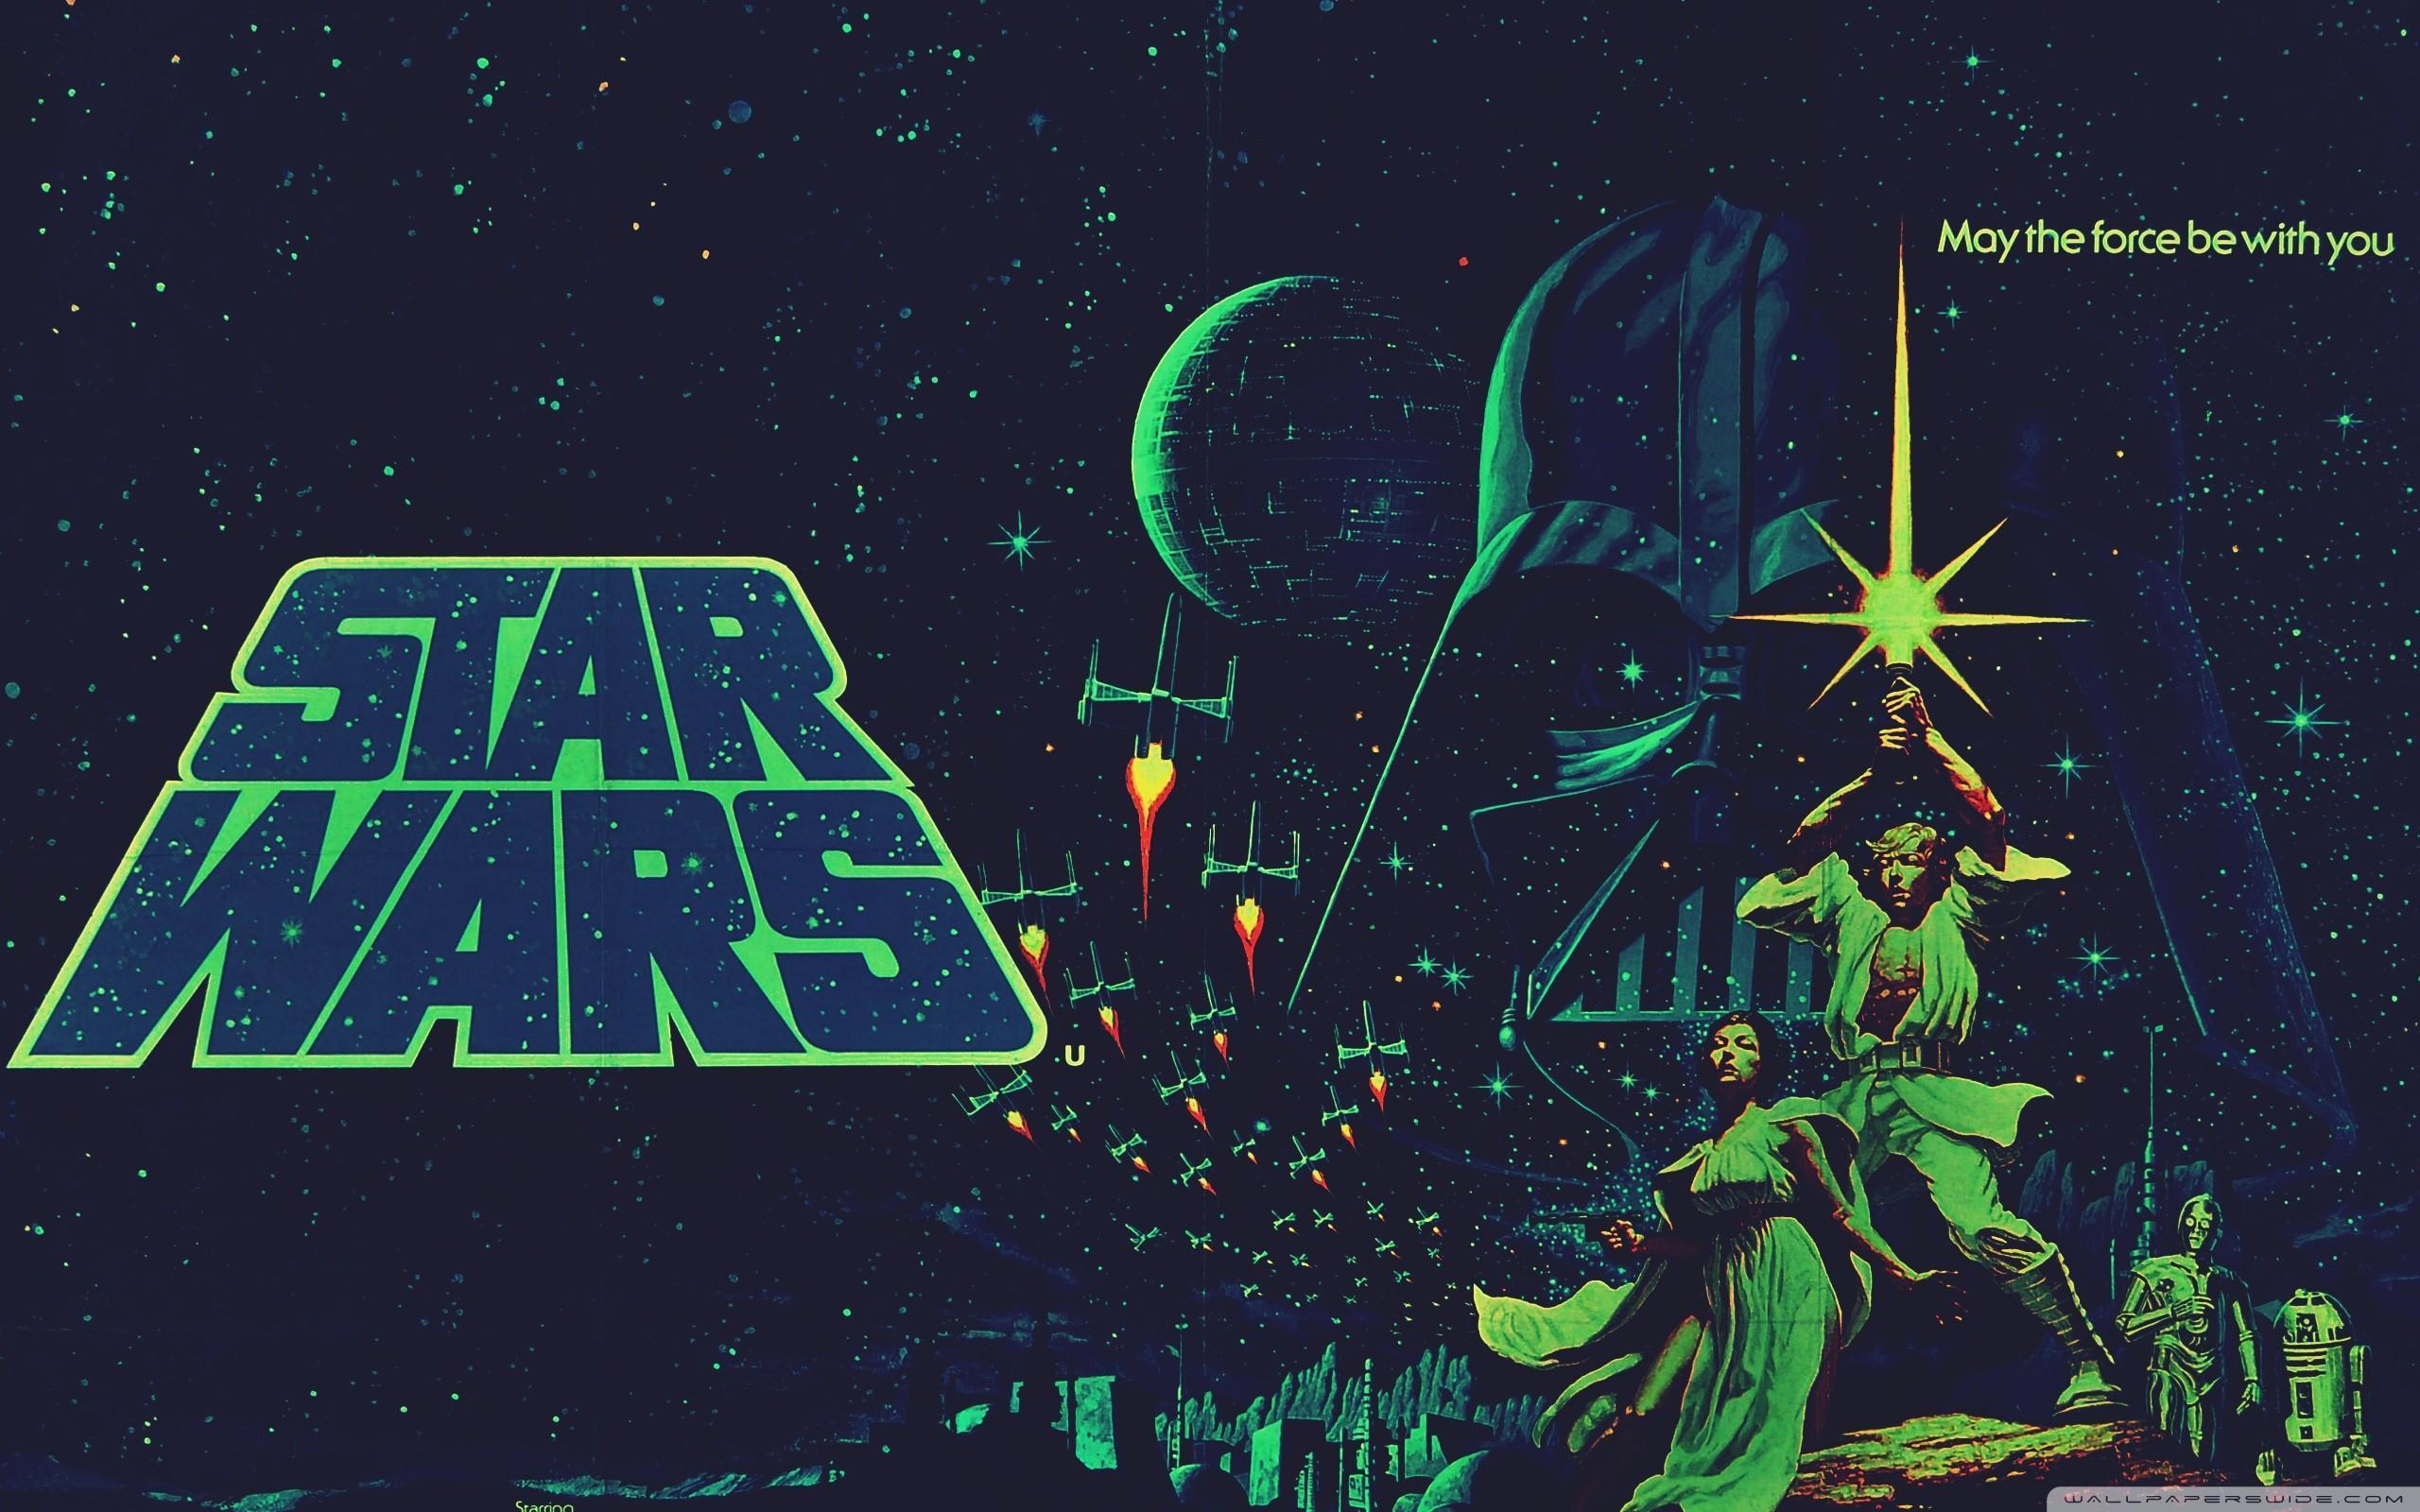 Vintage Star Wars Wallpapers Top Free Vintage Star Wars Backgrounds Wallpaperaccess